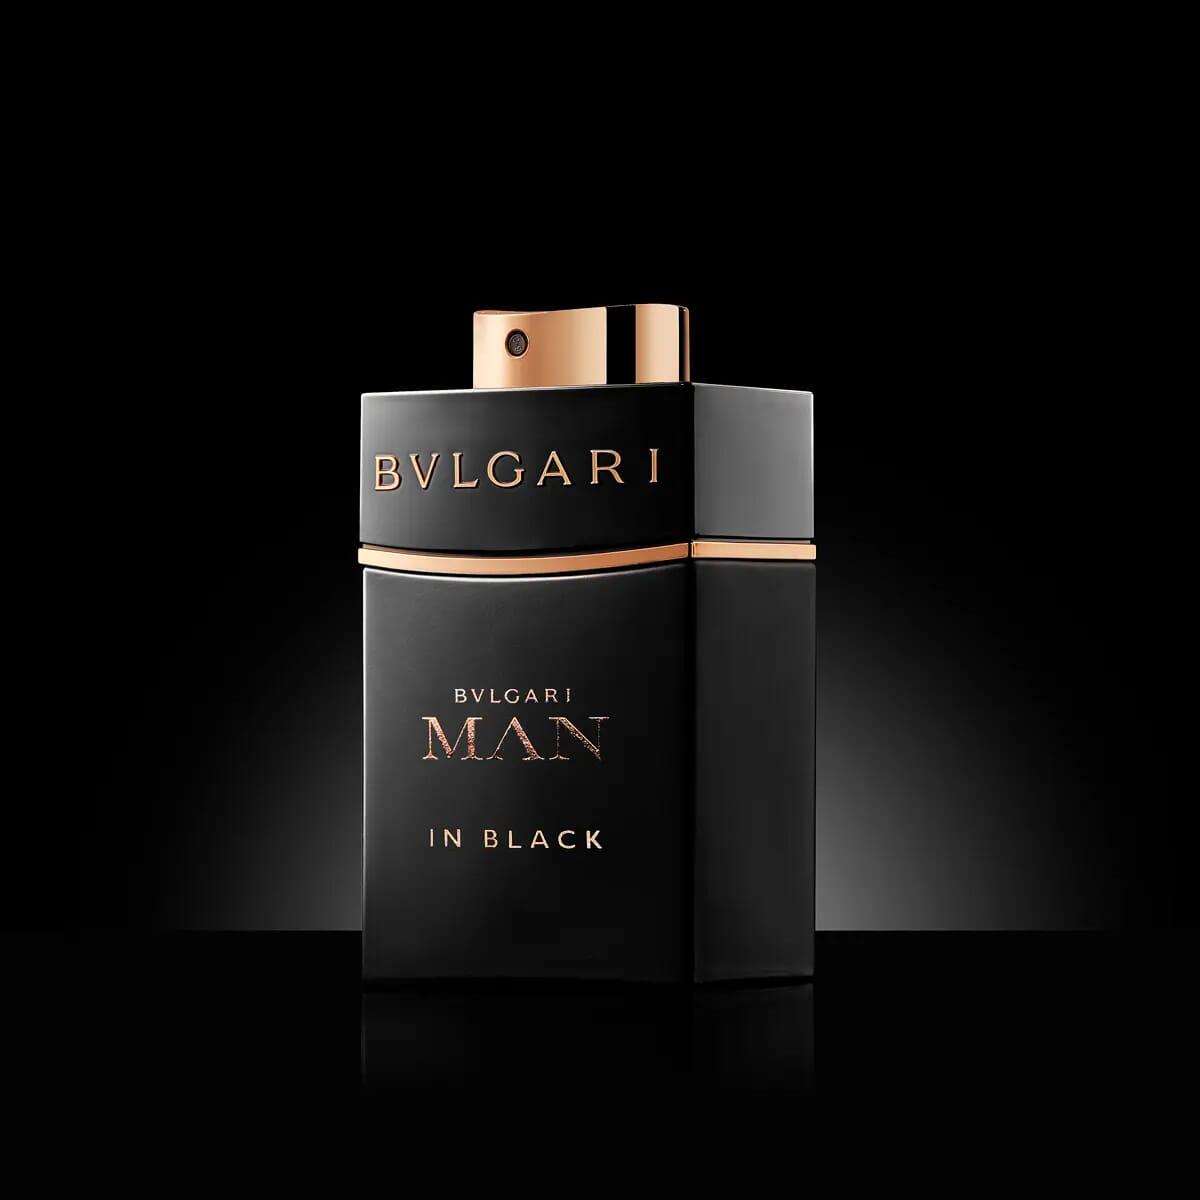 Bvlgari man in black perfume London still life photographer